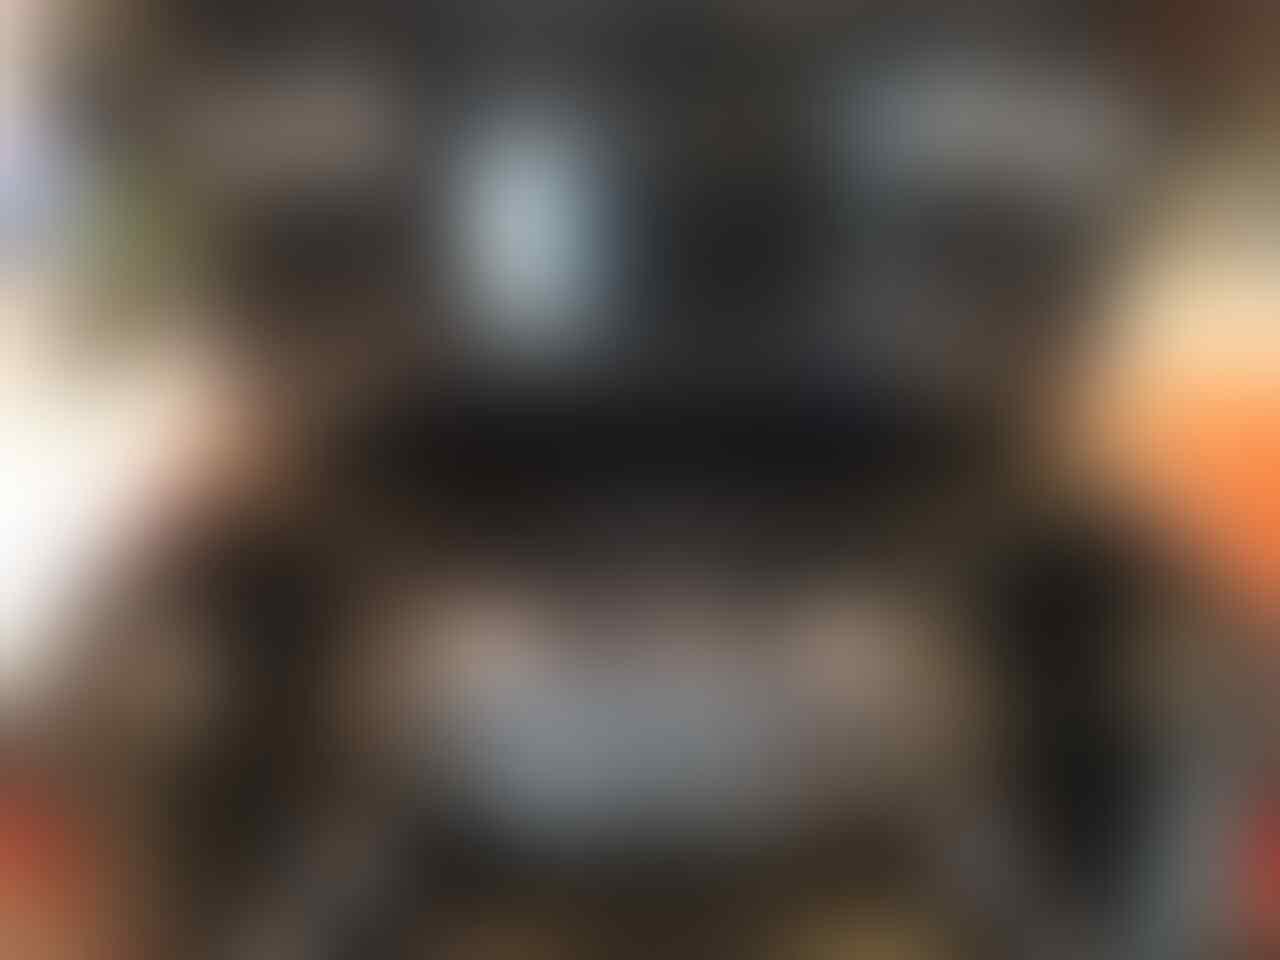 FR BlackAuto Battle Tanggal 18 Desember 2016 Surabaya: FINAL KREATIVITAS OTOMOTIF